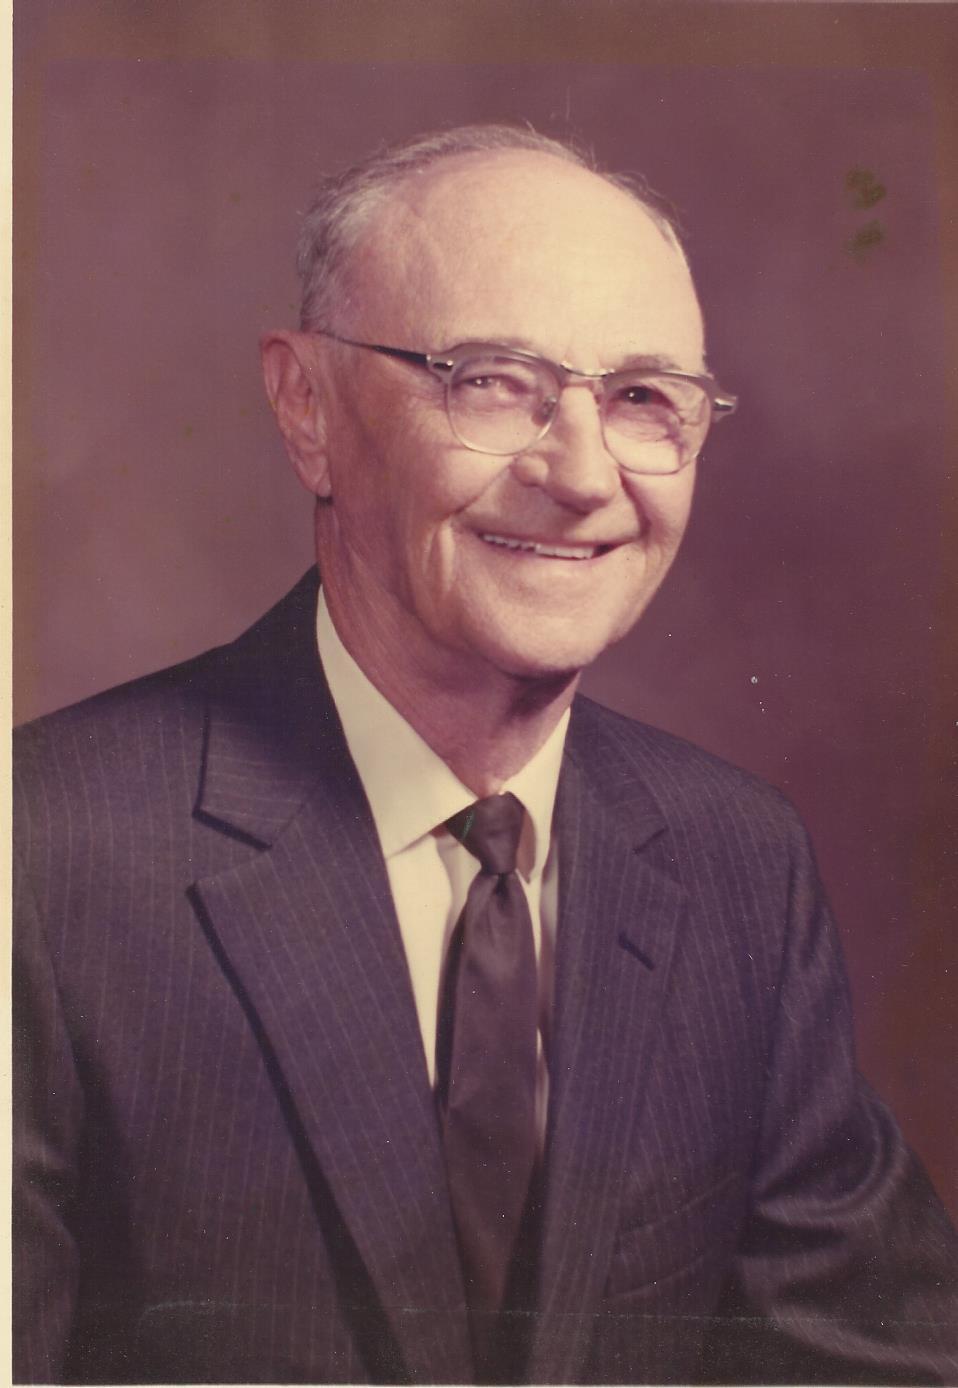 Arthur Merlin Tick Moran